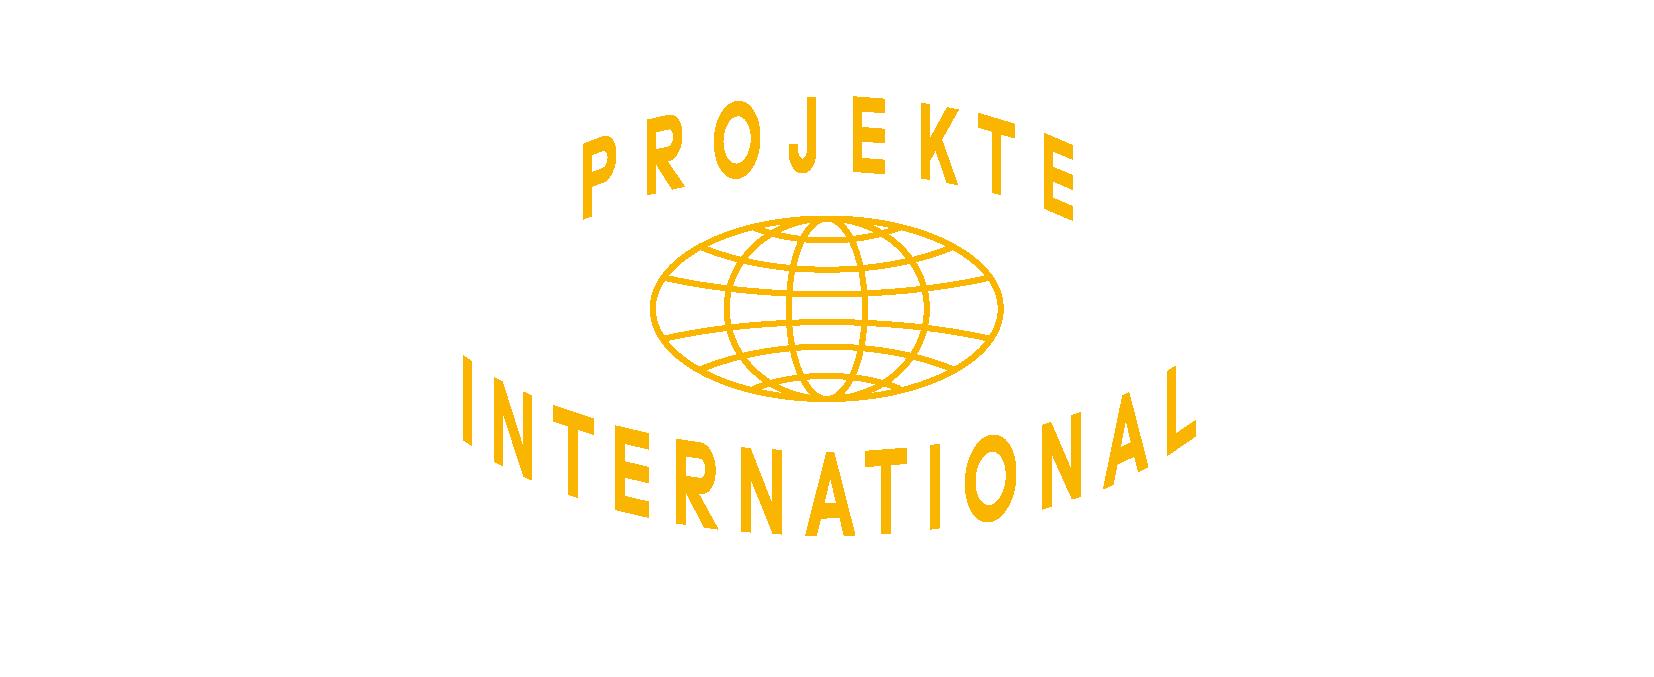 projekte-international1